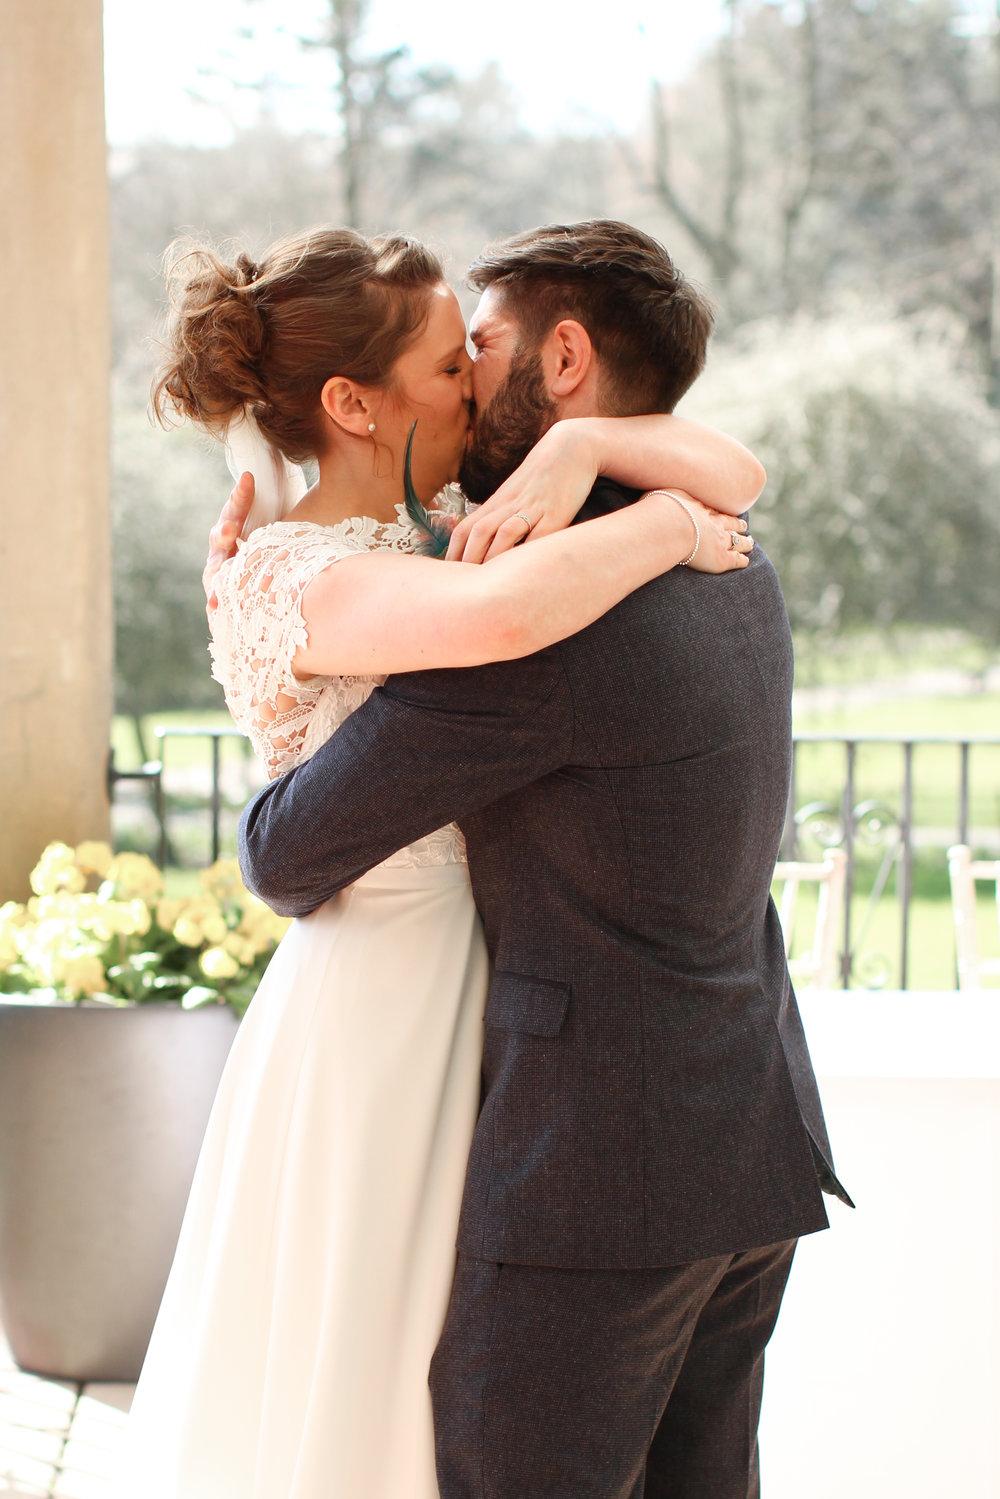 The Kiss! Sun Pavilion Little sixpence Photography